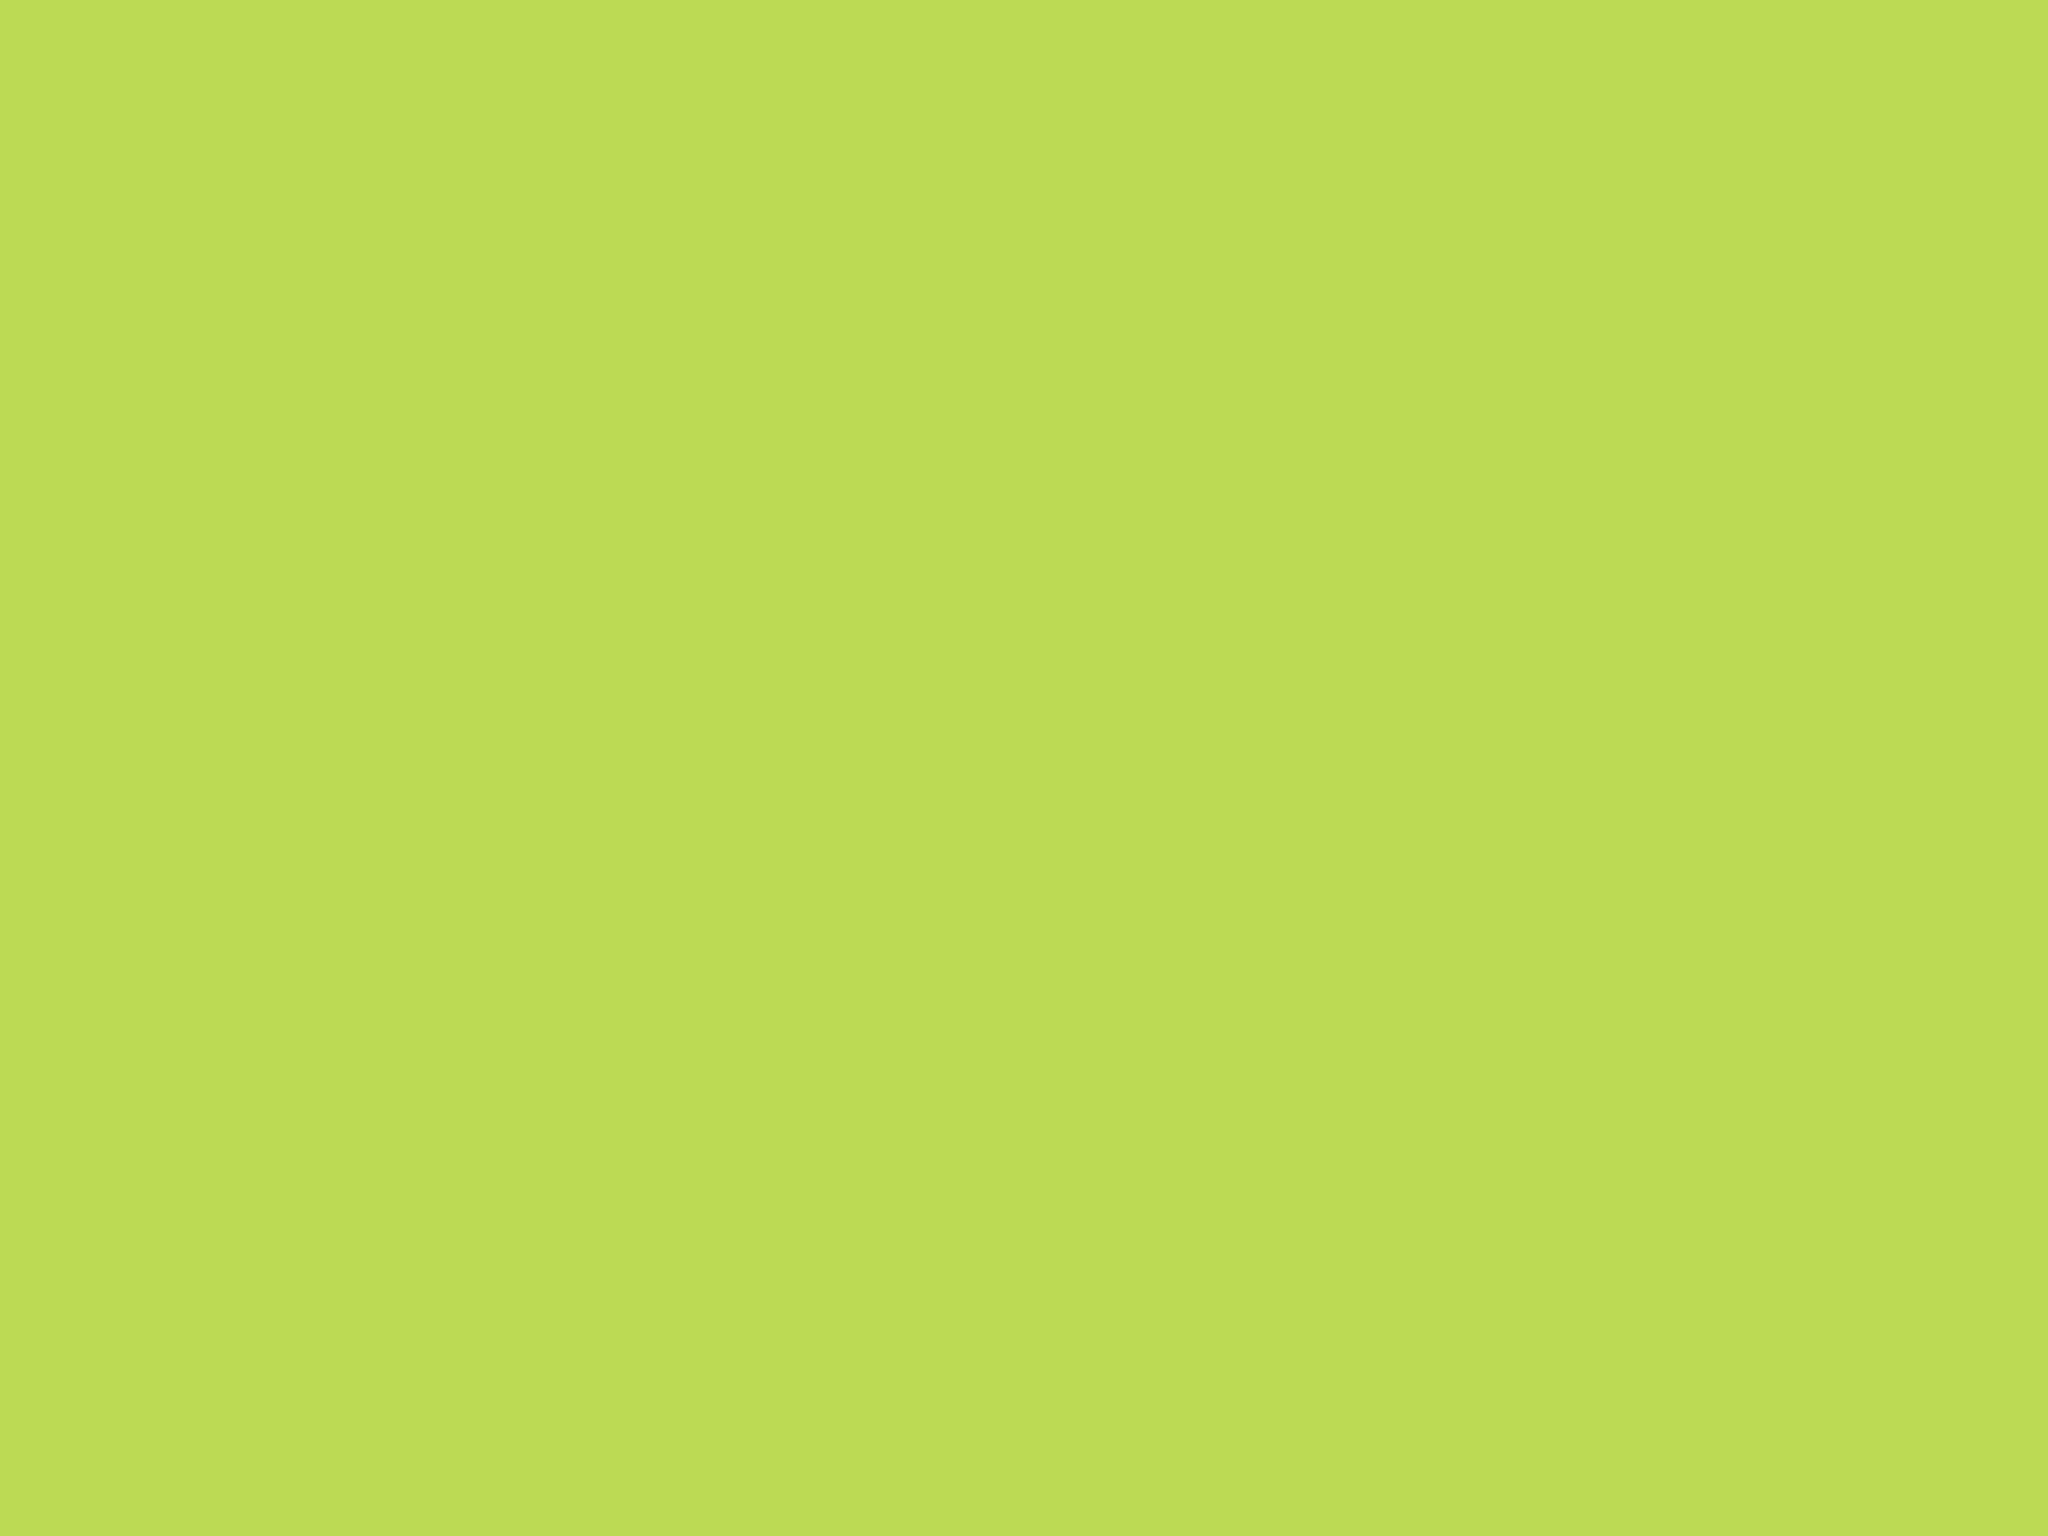 2048x1536 June Bud Solid Color Background